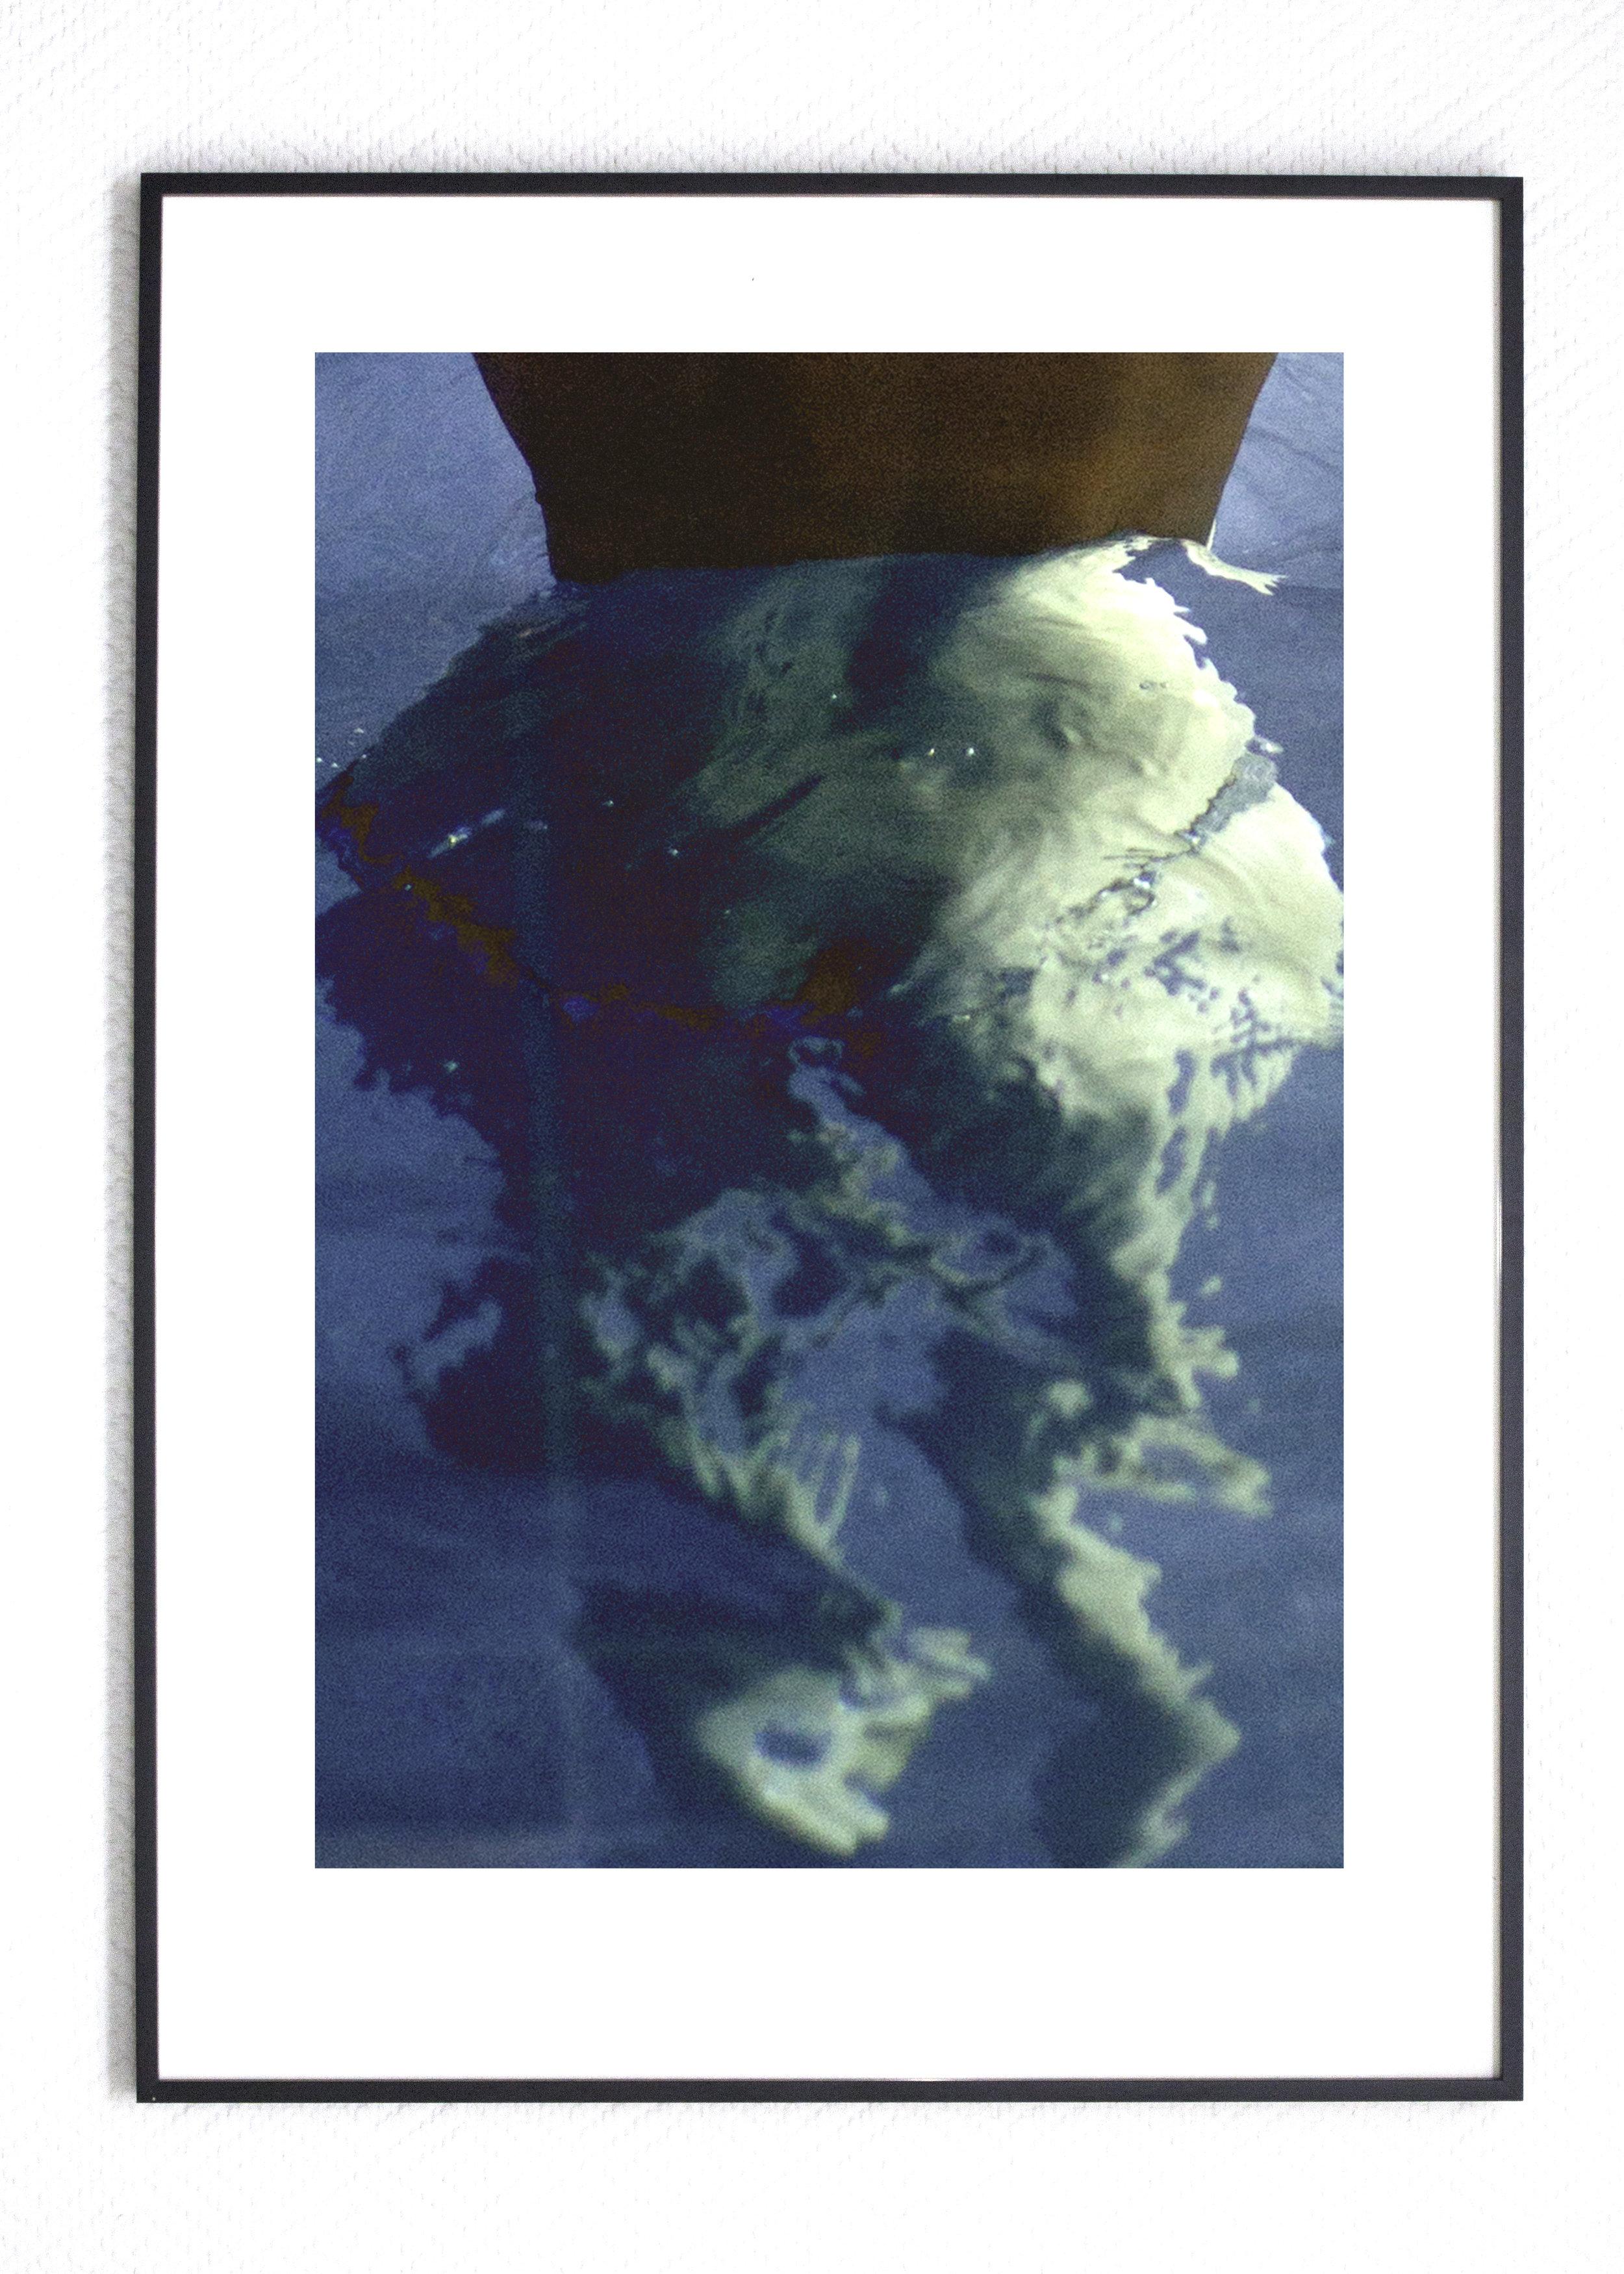 Submerged Edition 25+2AP Fine Art Giclée Print 5000,-